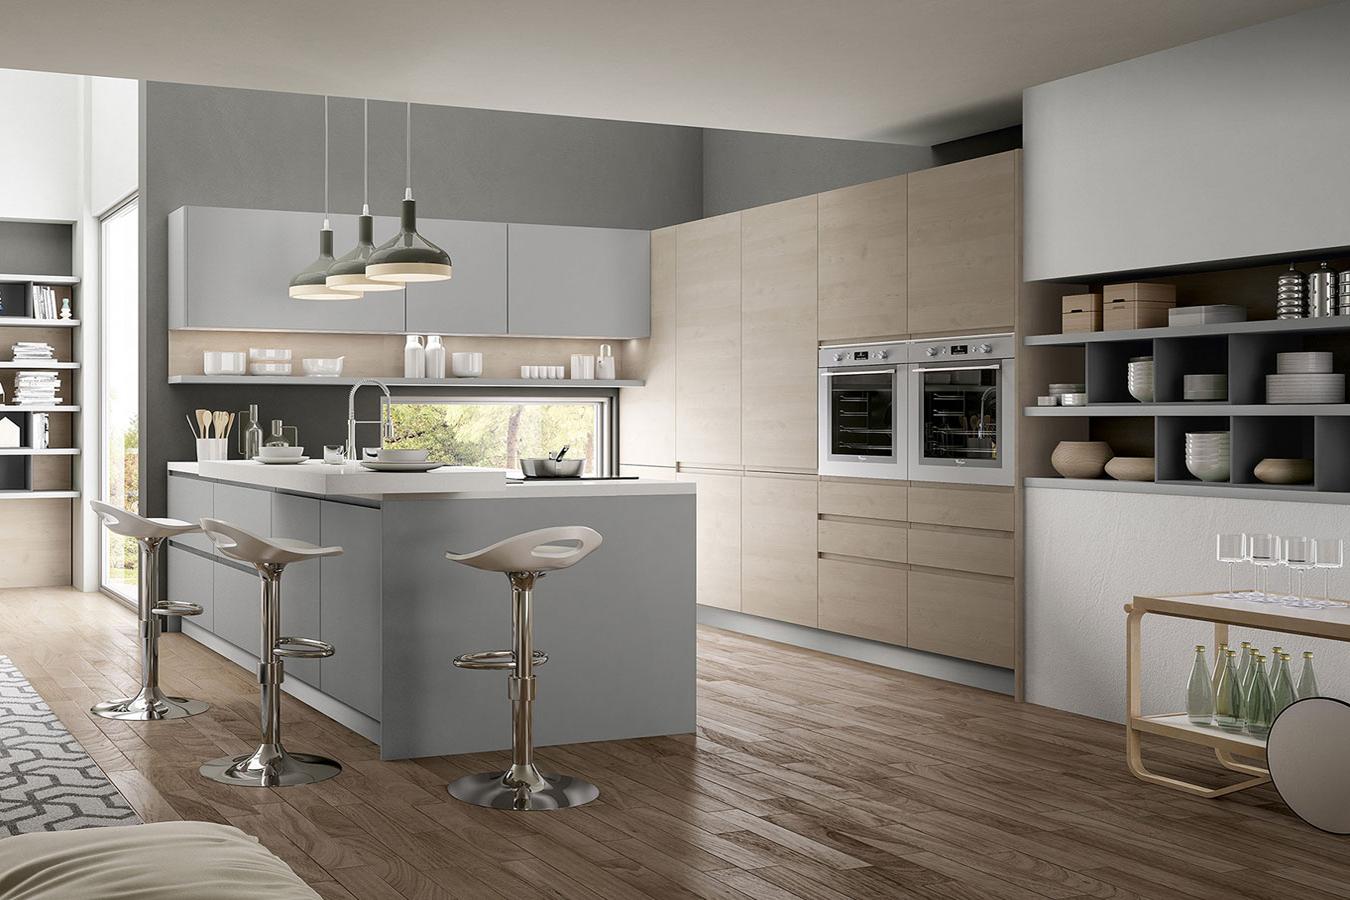 Cucina wega di arredo3 righetti mobili novara - Arredo3 cucine moderne ...